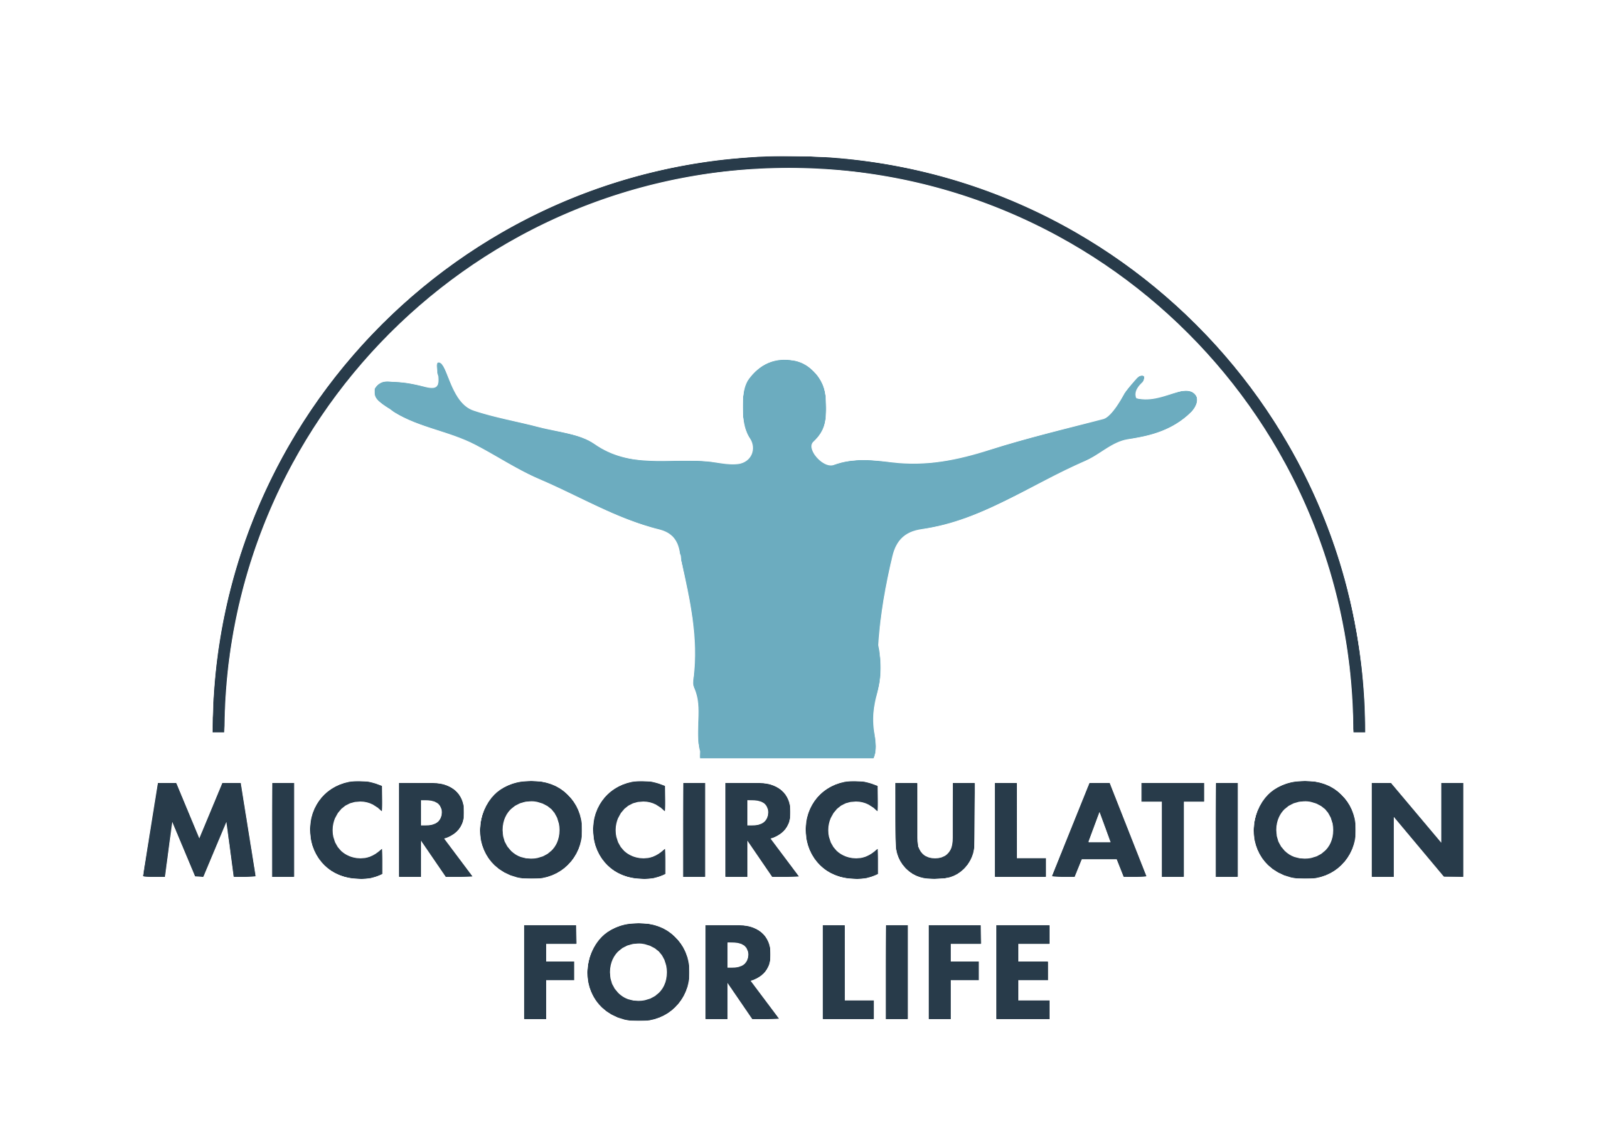 Microcirculation For Life